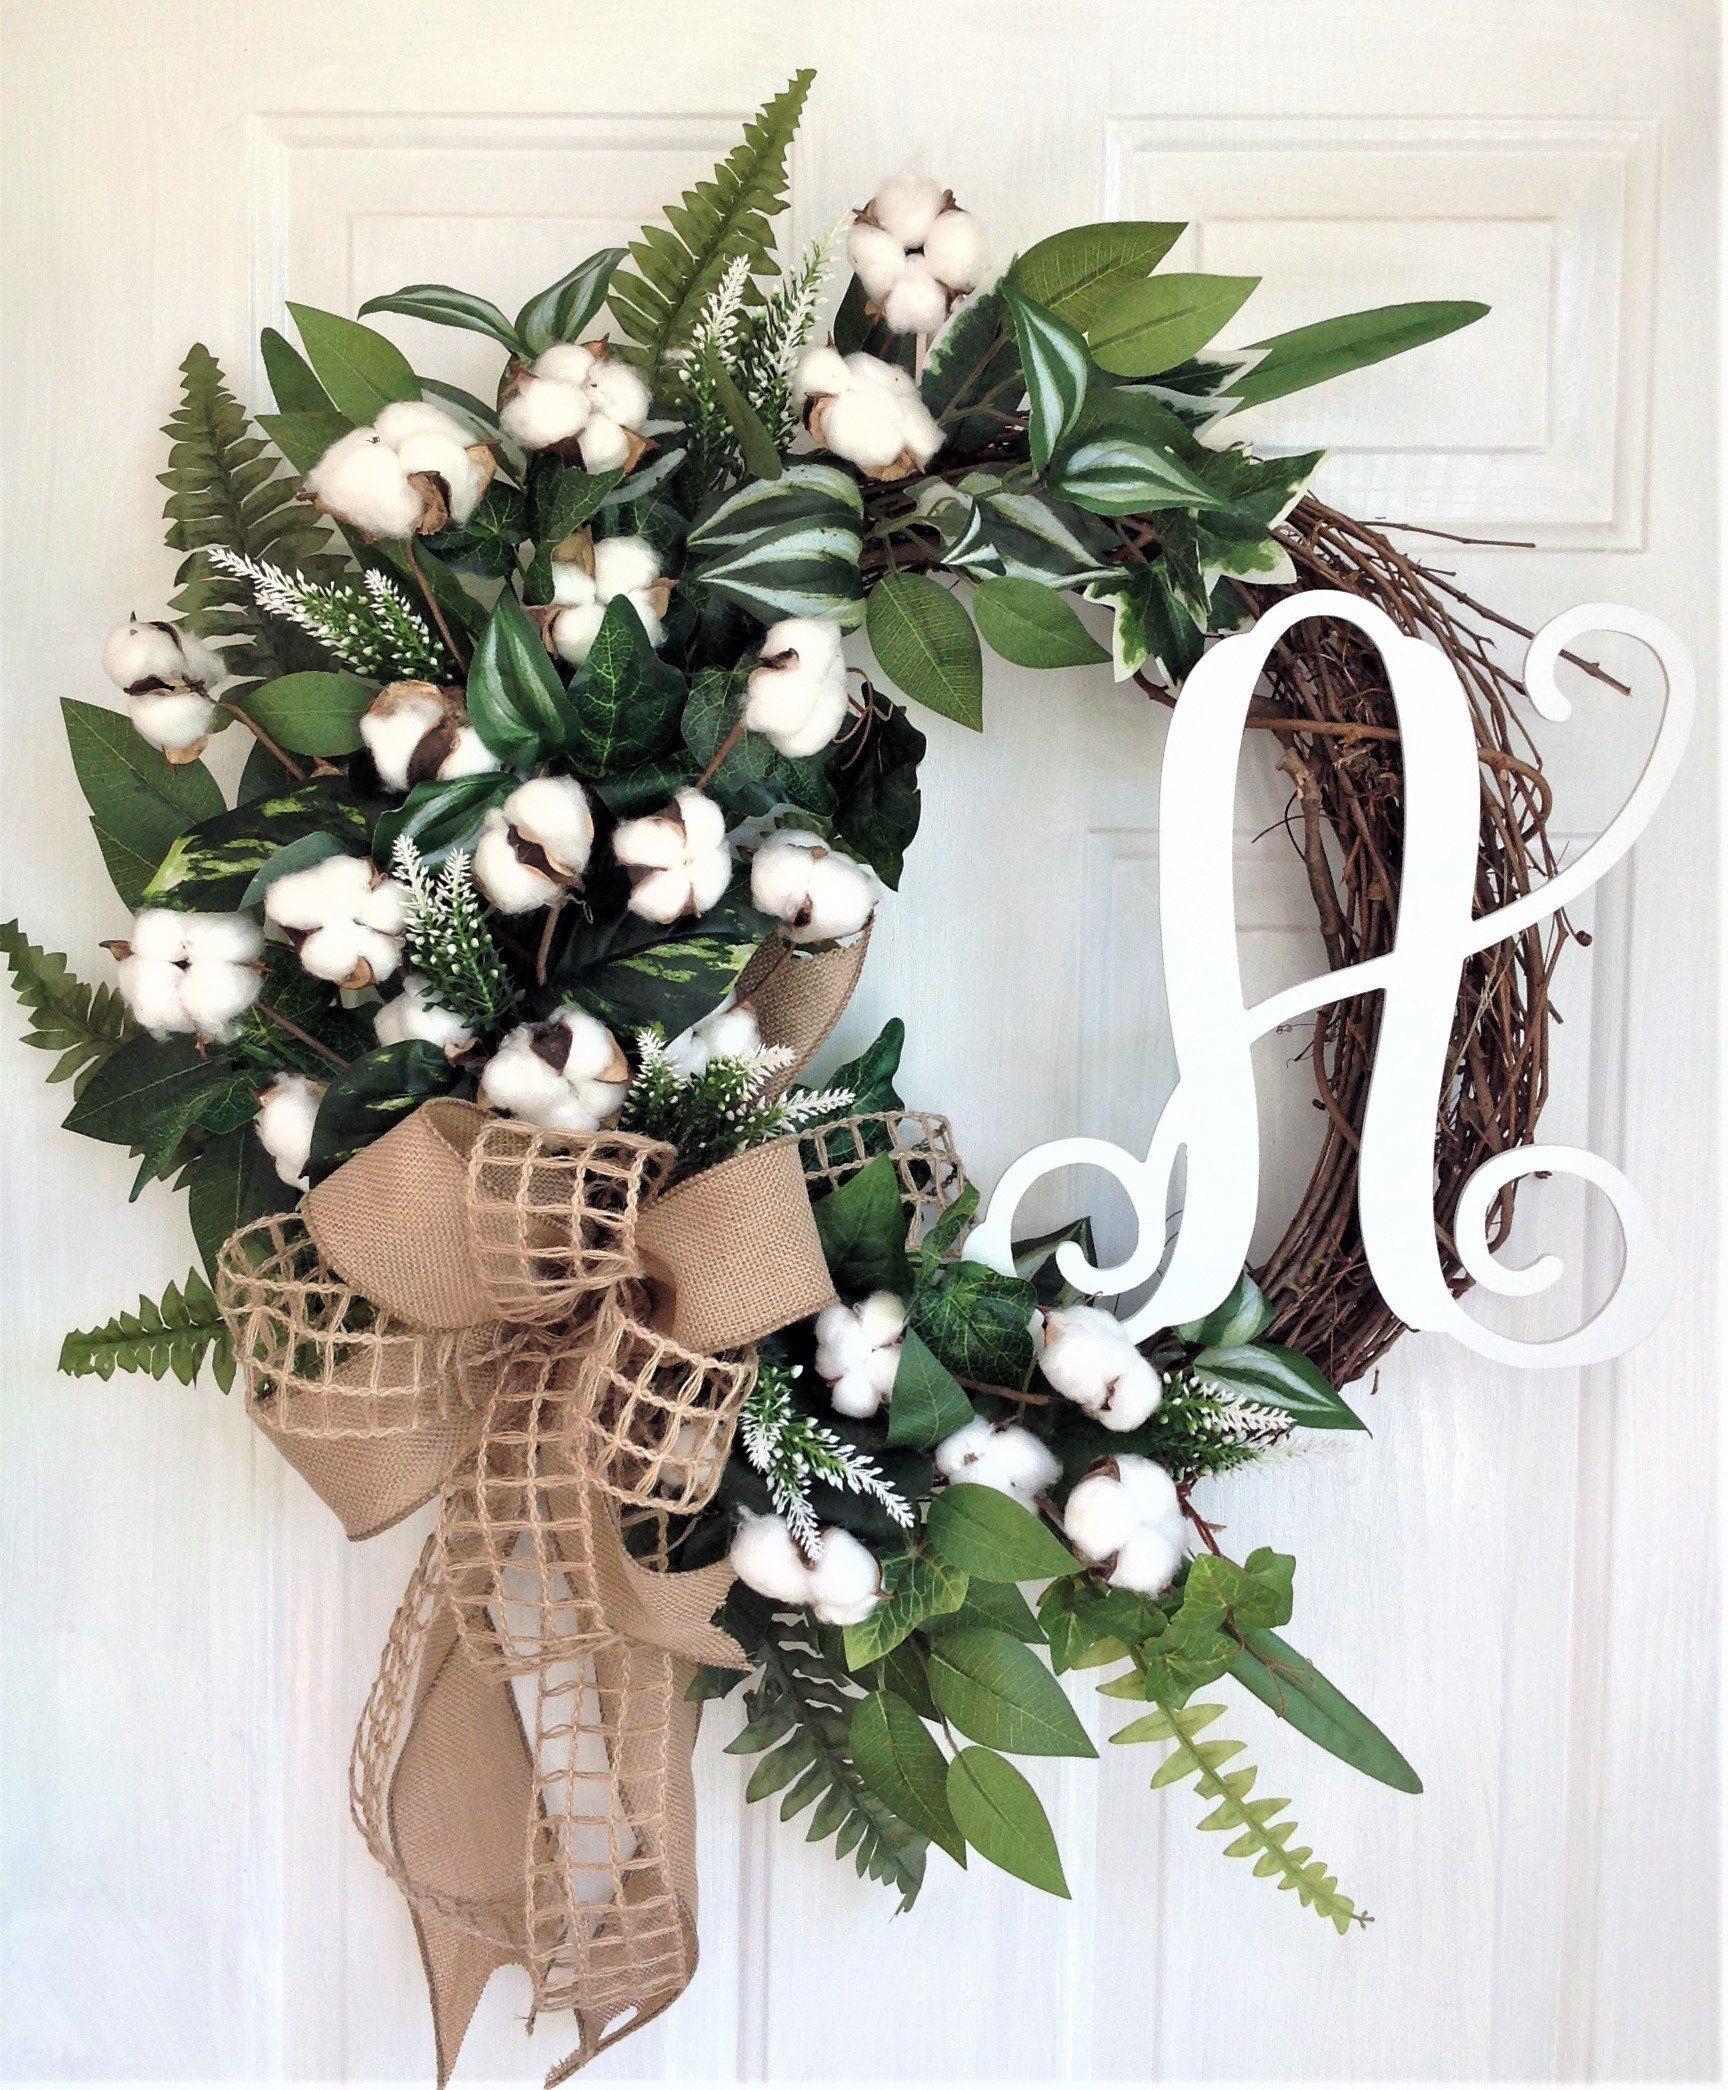 Photo of Cotton Wreath, Front Door Wreath, Farmhouse Wreath, Year Round Wreath, Everyday Wreath, Cotton Burlap Wreath, Welcome Wreath, Summer Wreath